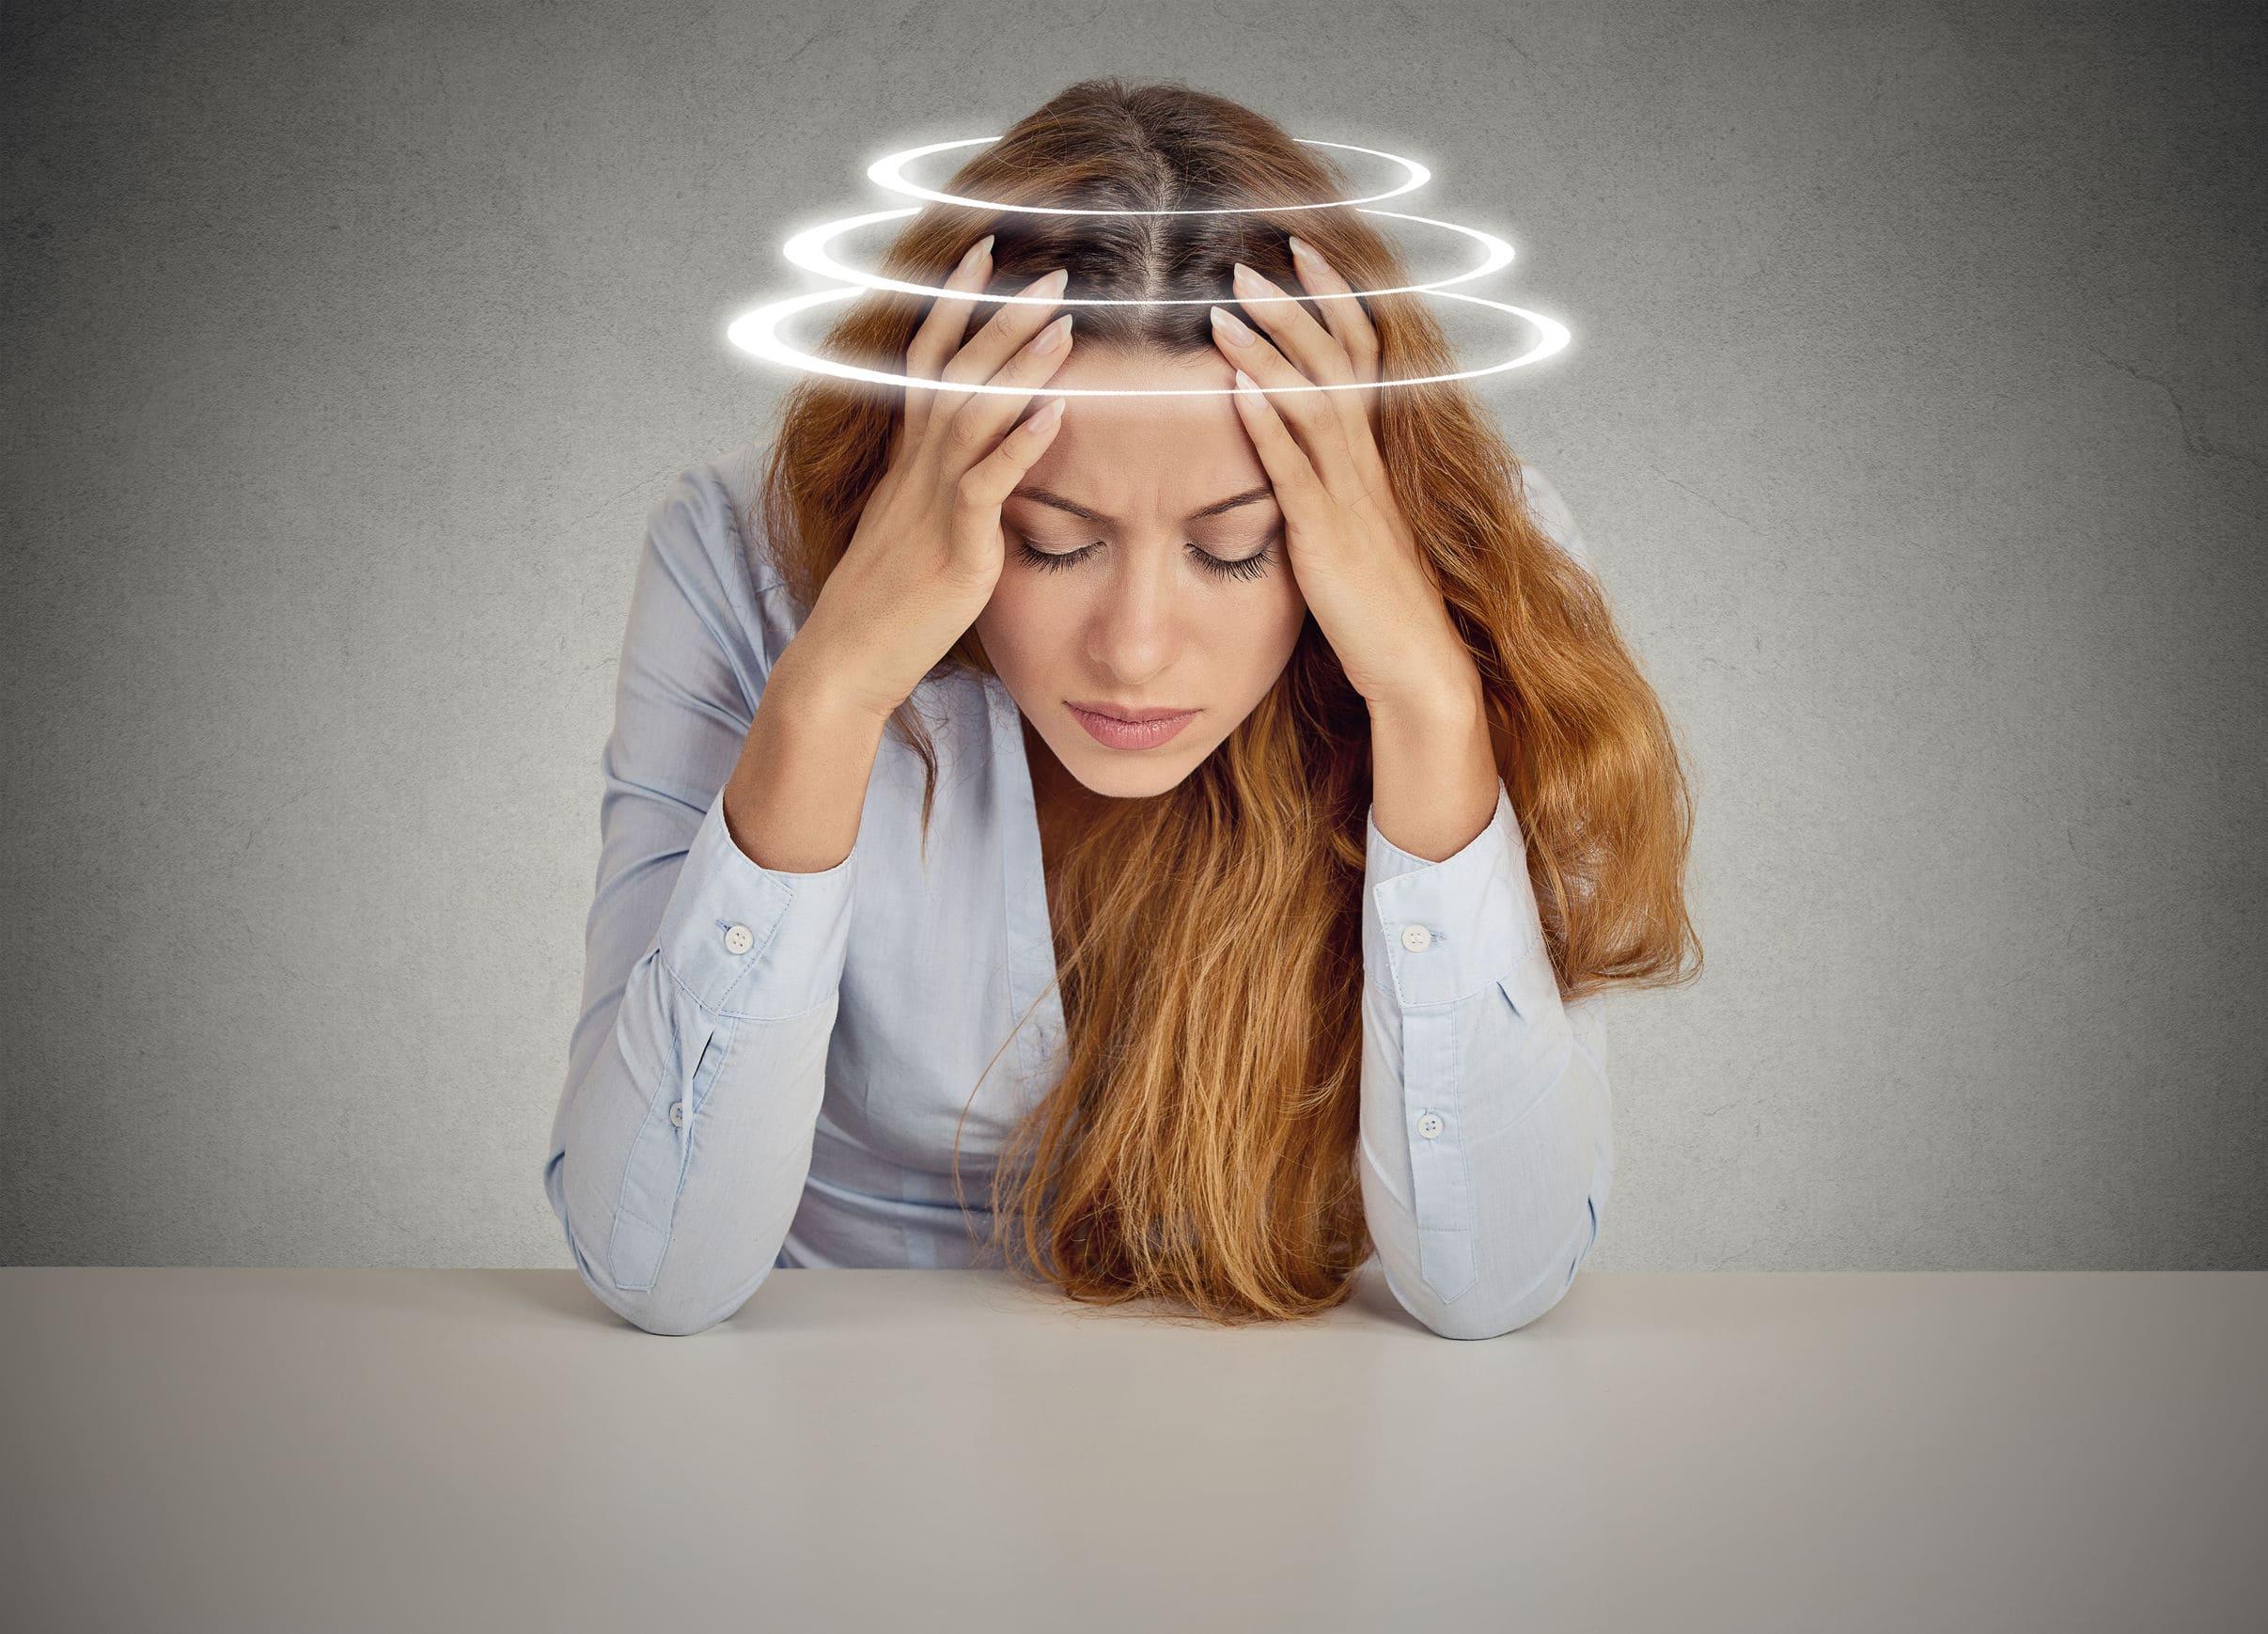 Treating Vertigo and Vestibulopathy with Vestibular Rehabilitation - Vertigo and Vestibulopathy Treatment | https://physiologicnyc.com/physical-therapy/